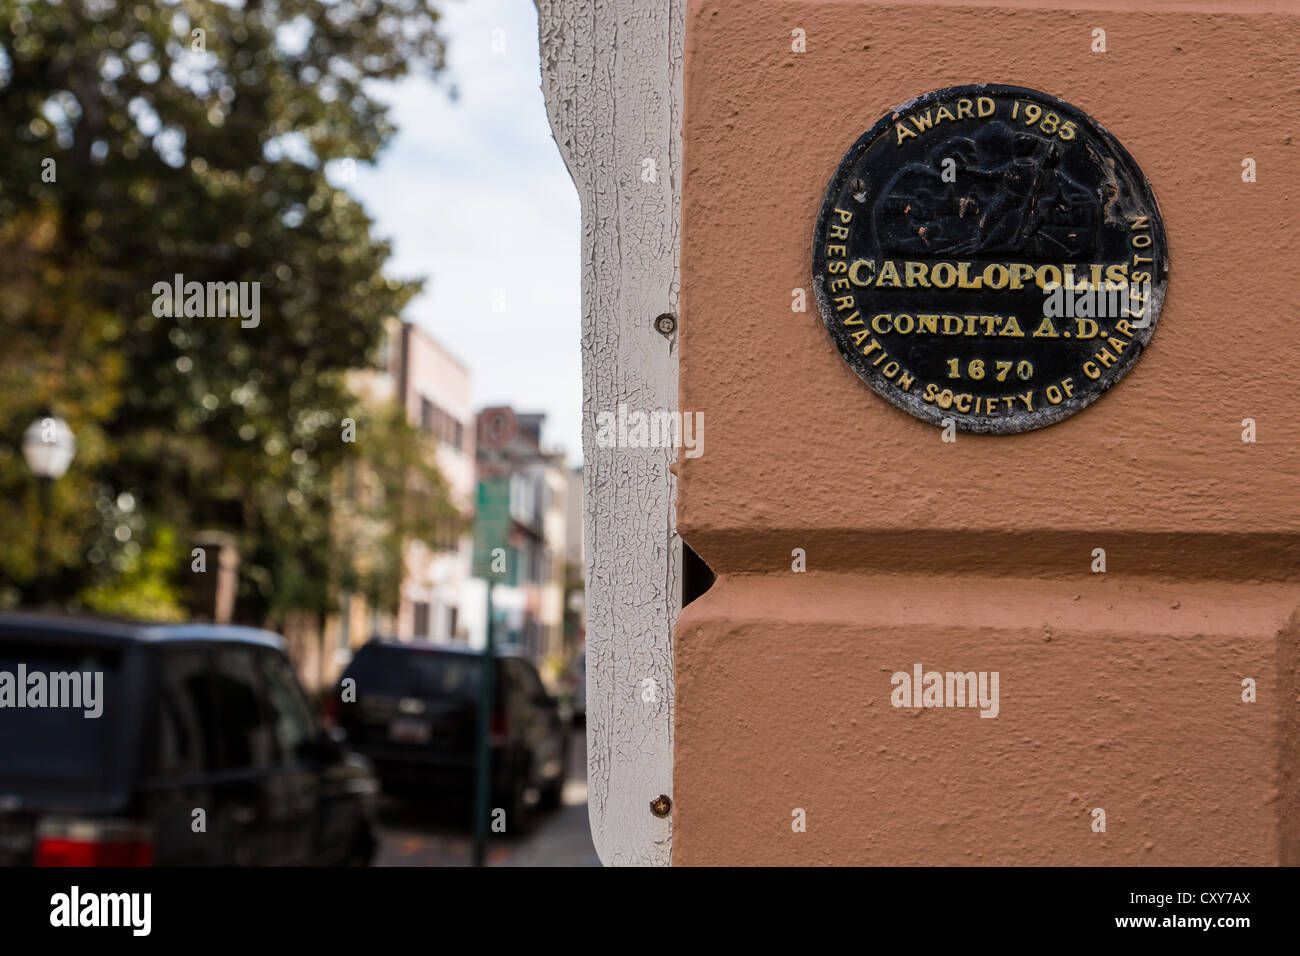 Carolopolis Pro Merito Award medallion on a historic home in Charleston, SC. - Stock Image